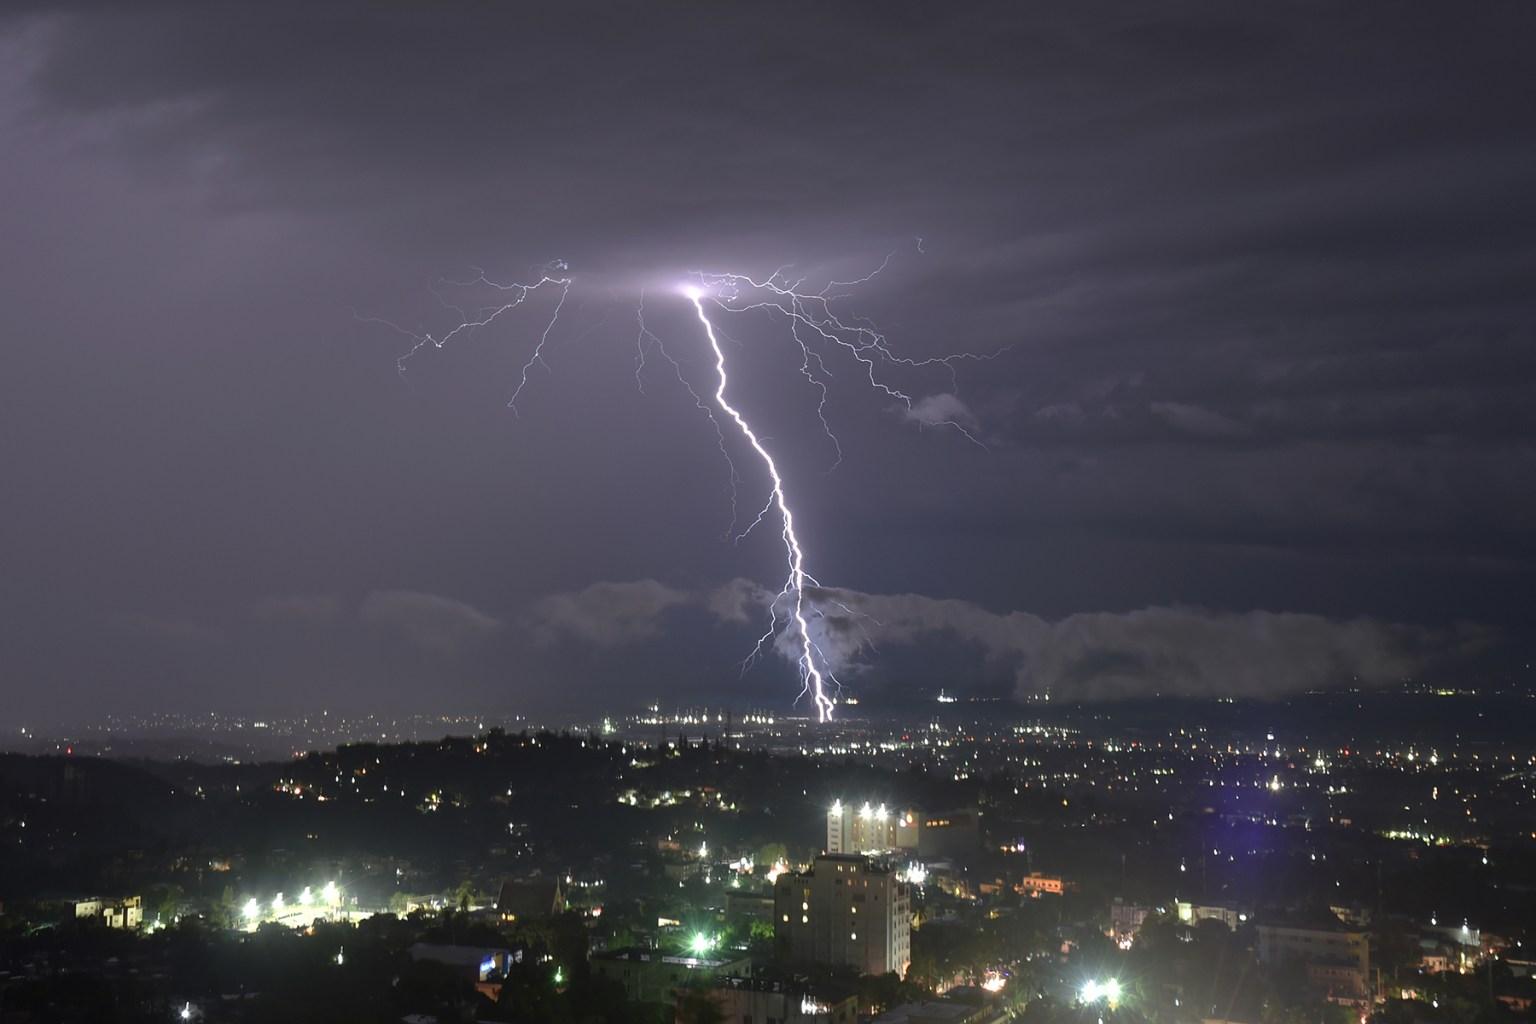 Lightning strikes over Port-au-Prince, Haiti, during a storm on Nov. 14. HECTOR RETAMAL/AFP/Getty Images